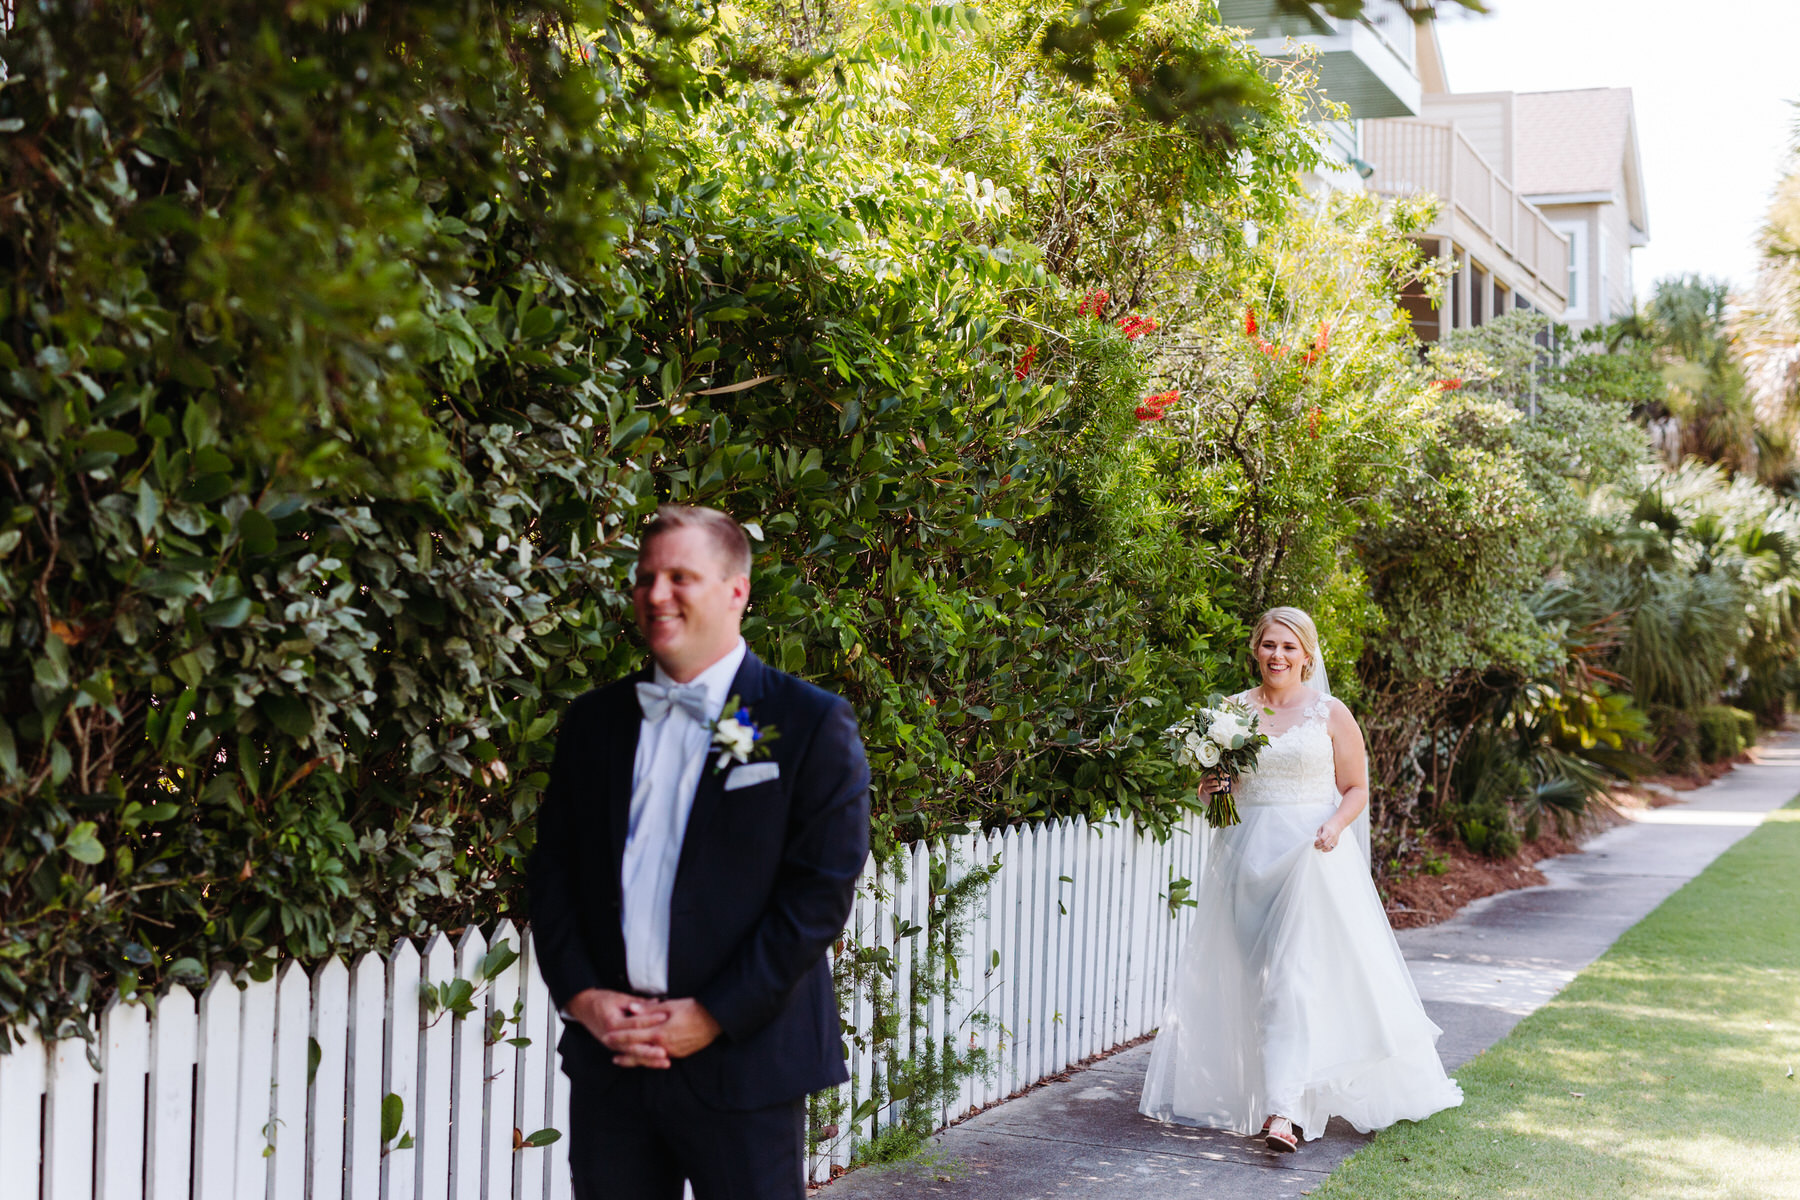 wild-dunes-charleston-isle-of-palms-IOP-wedding-761.JPG